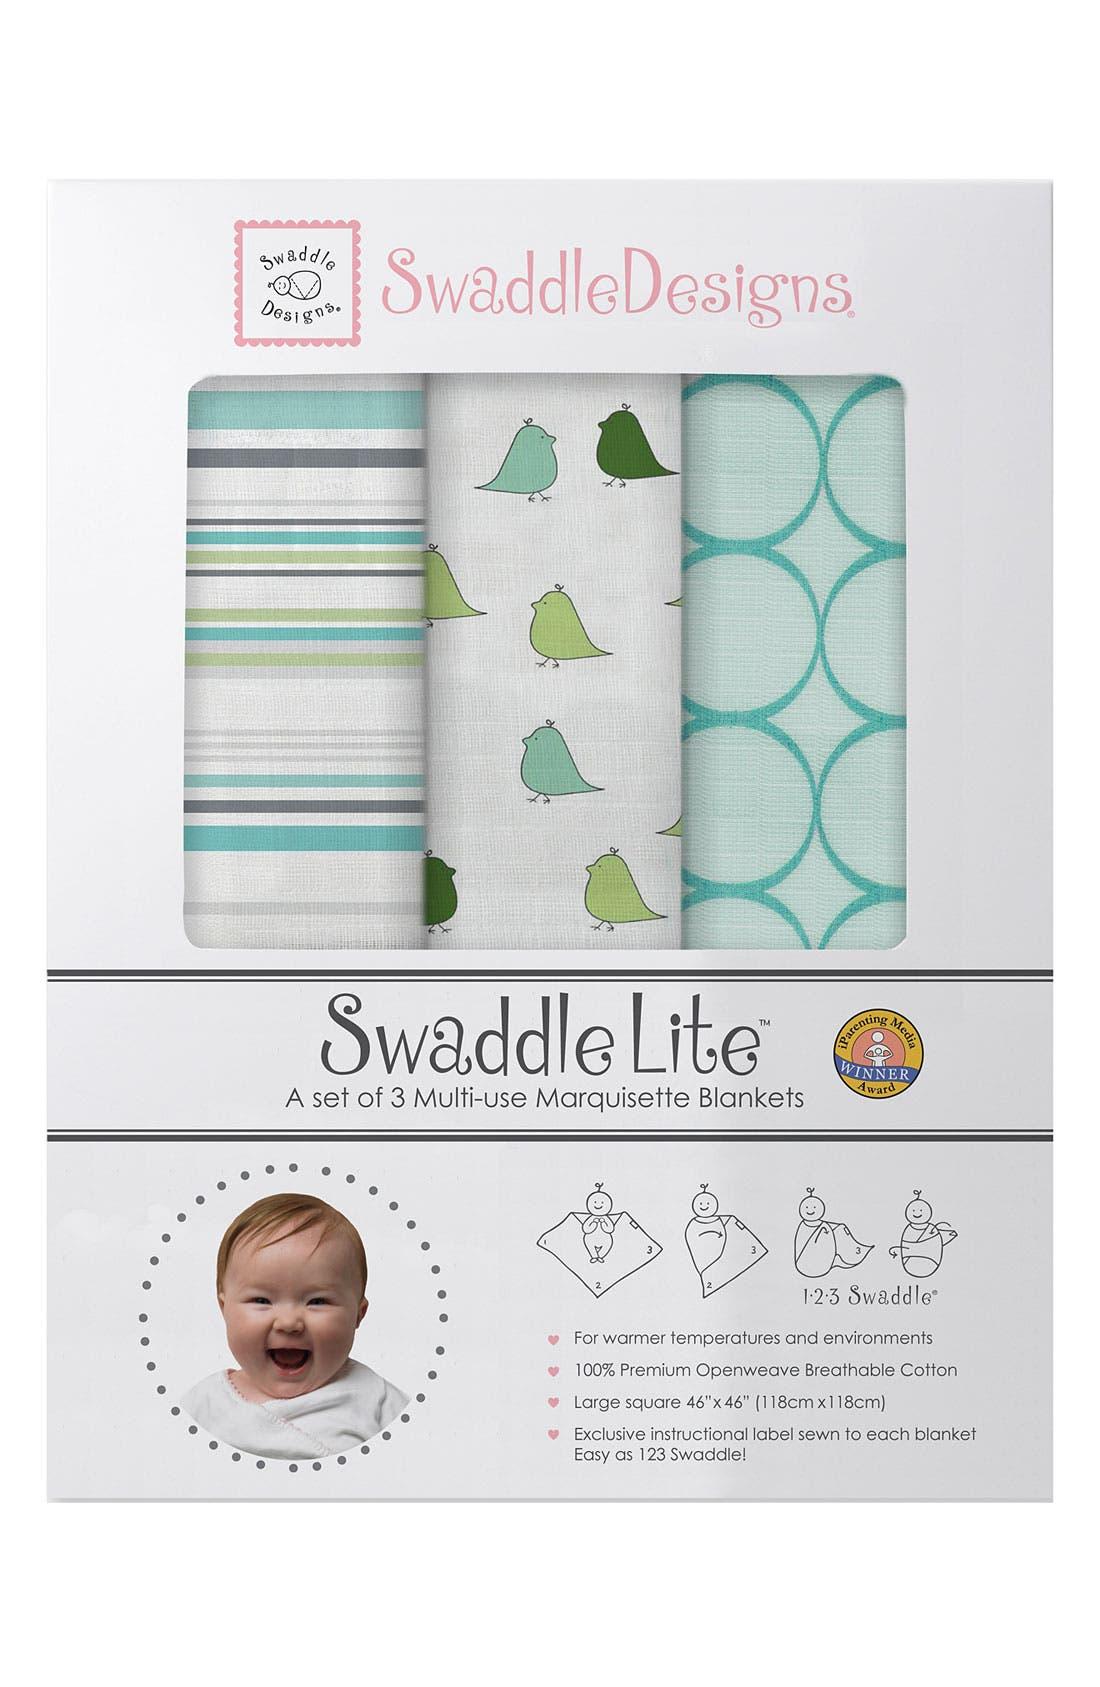 Alternate Image 1 Selected - Swaddle Designs 'Swaddle Lite' Marquisette Blanket (Set of 3)